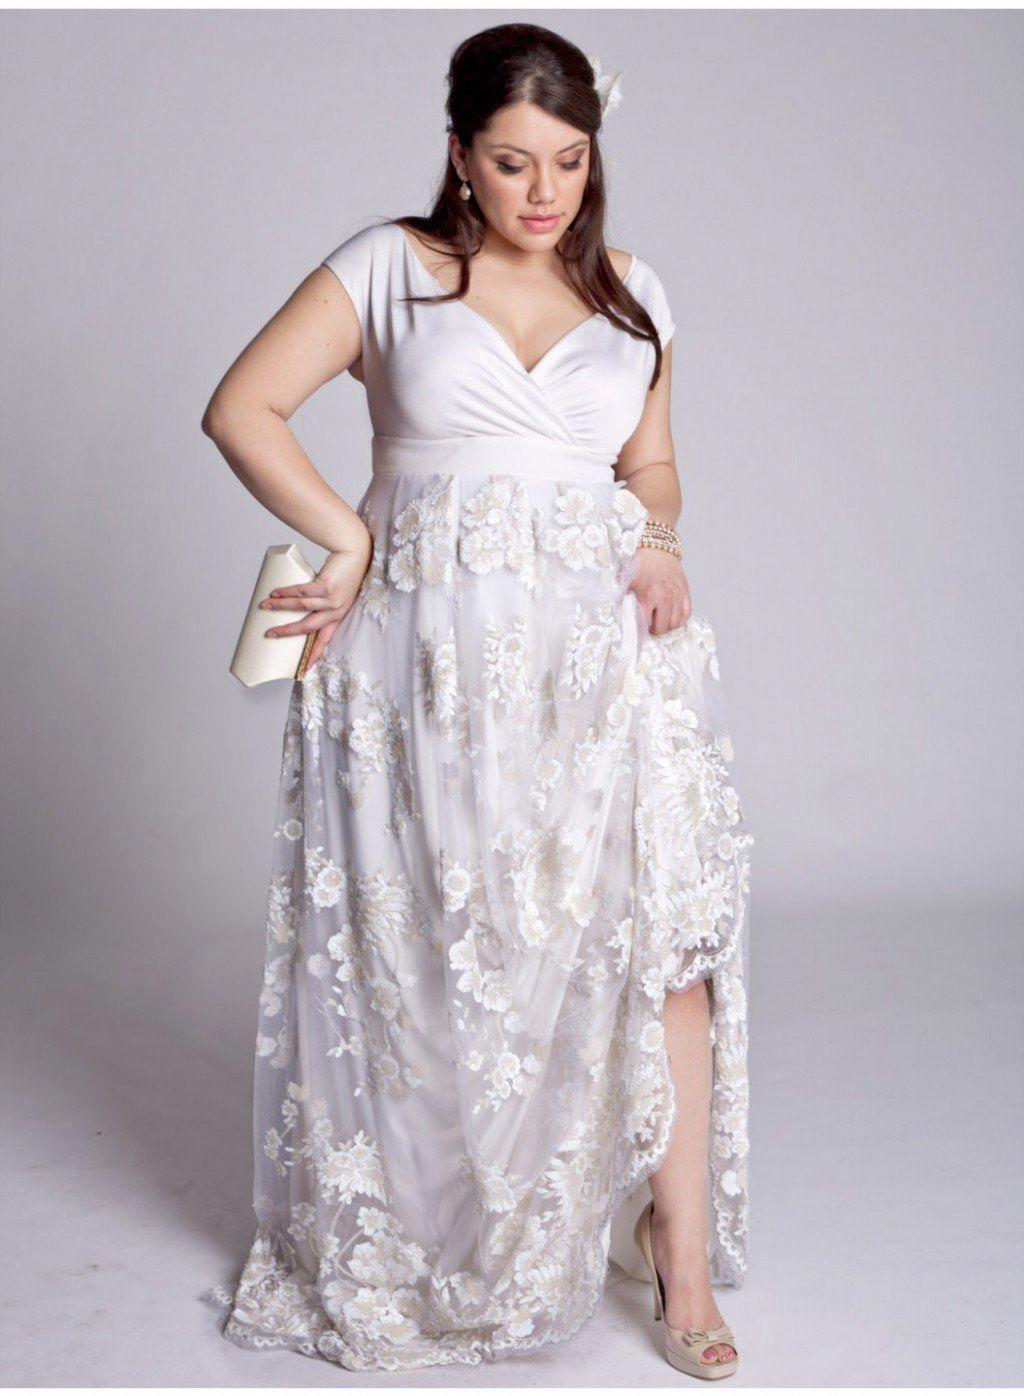 Plus Size Wedding Dresses To Feel Like A Princess Casual Wedding Dress Bridesmaid Dresses Plus Size Wedding Dresses Plus Size [ 1396 x 1024 Pixel ]